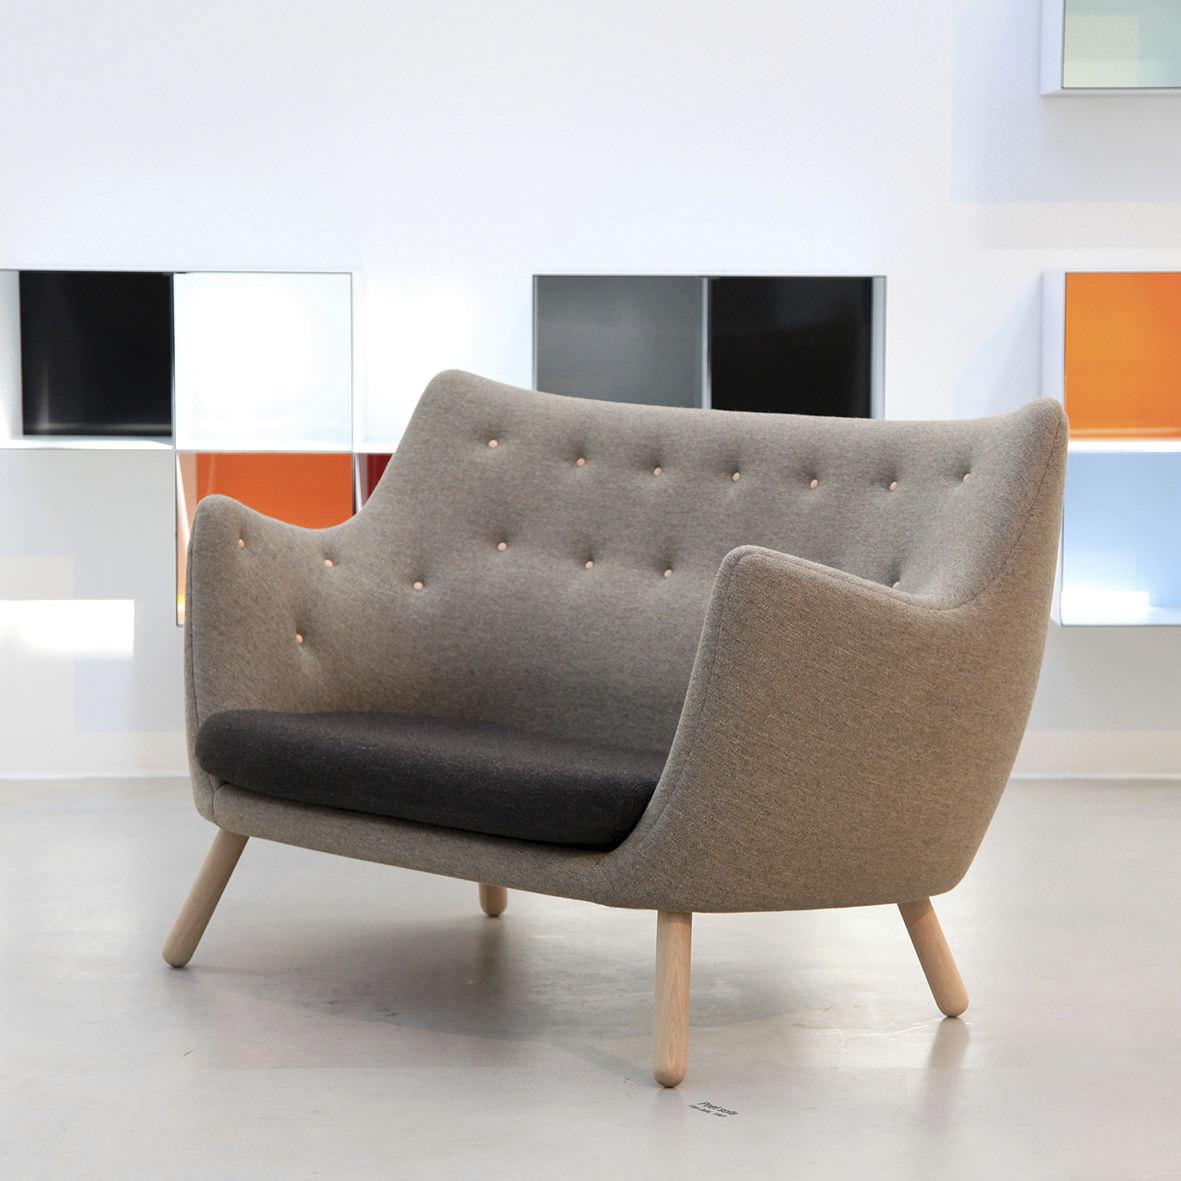 Sofa Skandinavisches Design Holz Stoff Von Finn Juhl